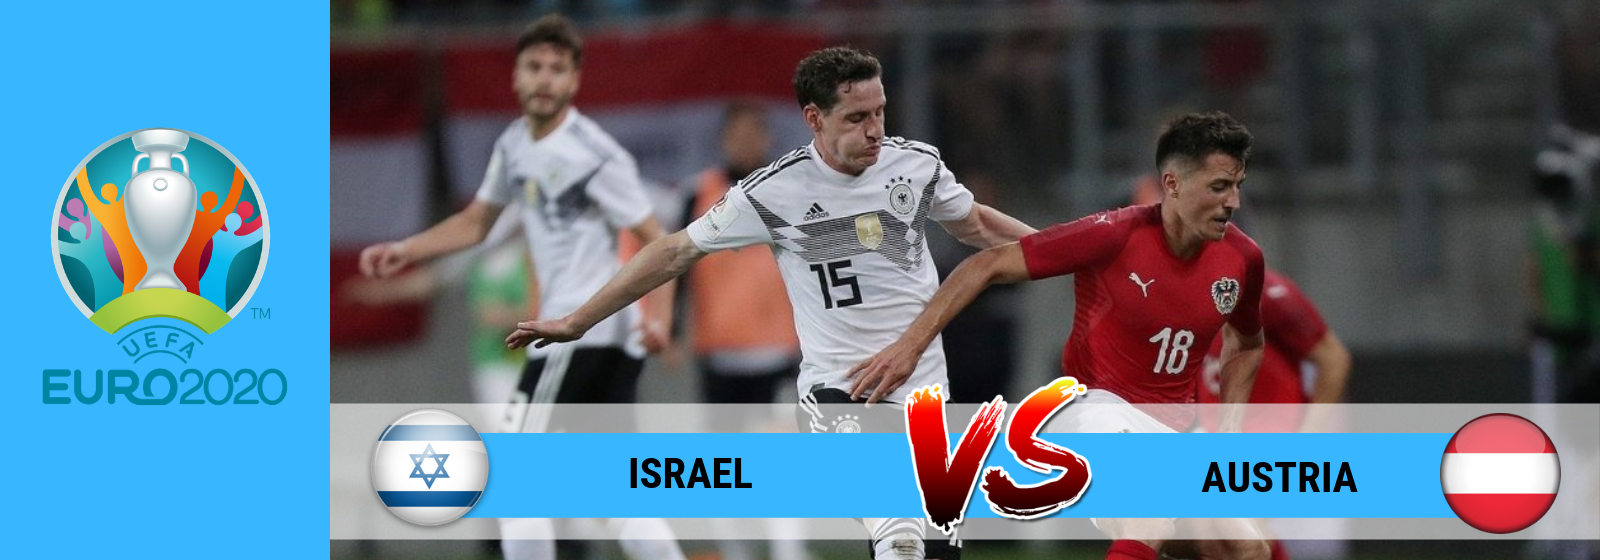 Israel vs Austria AsianOdds